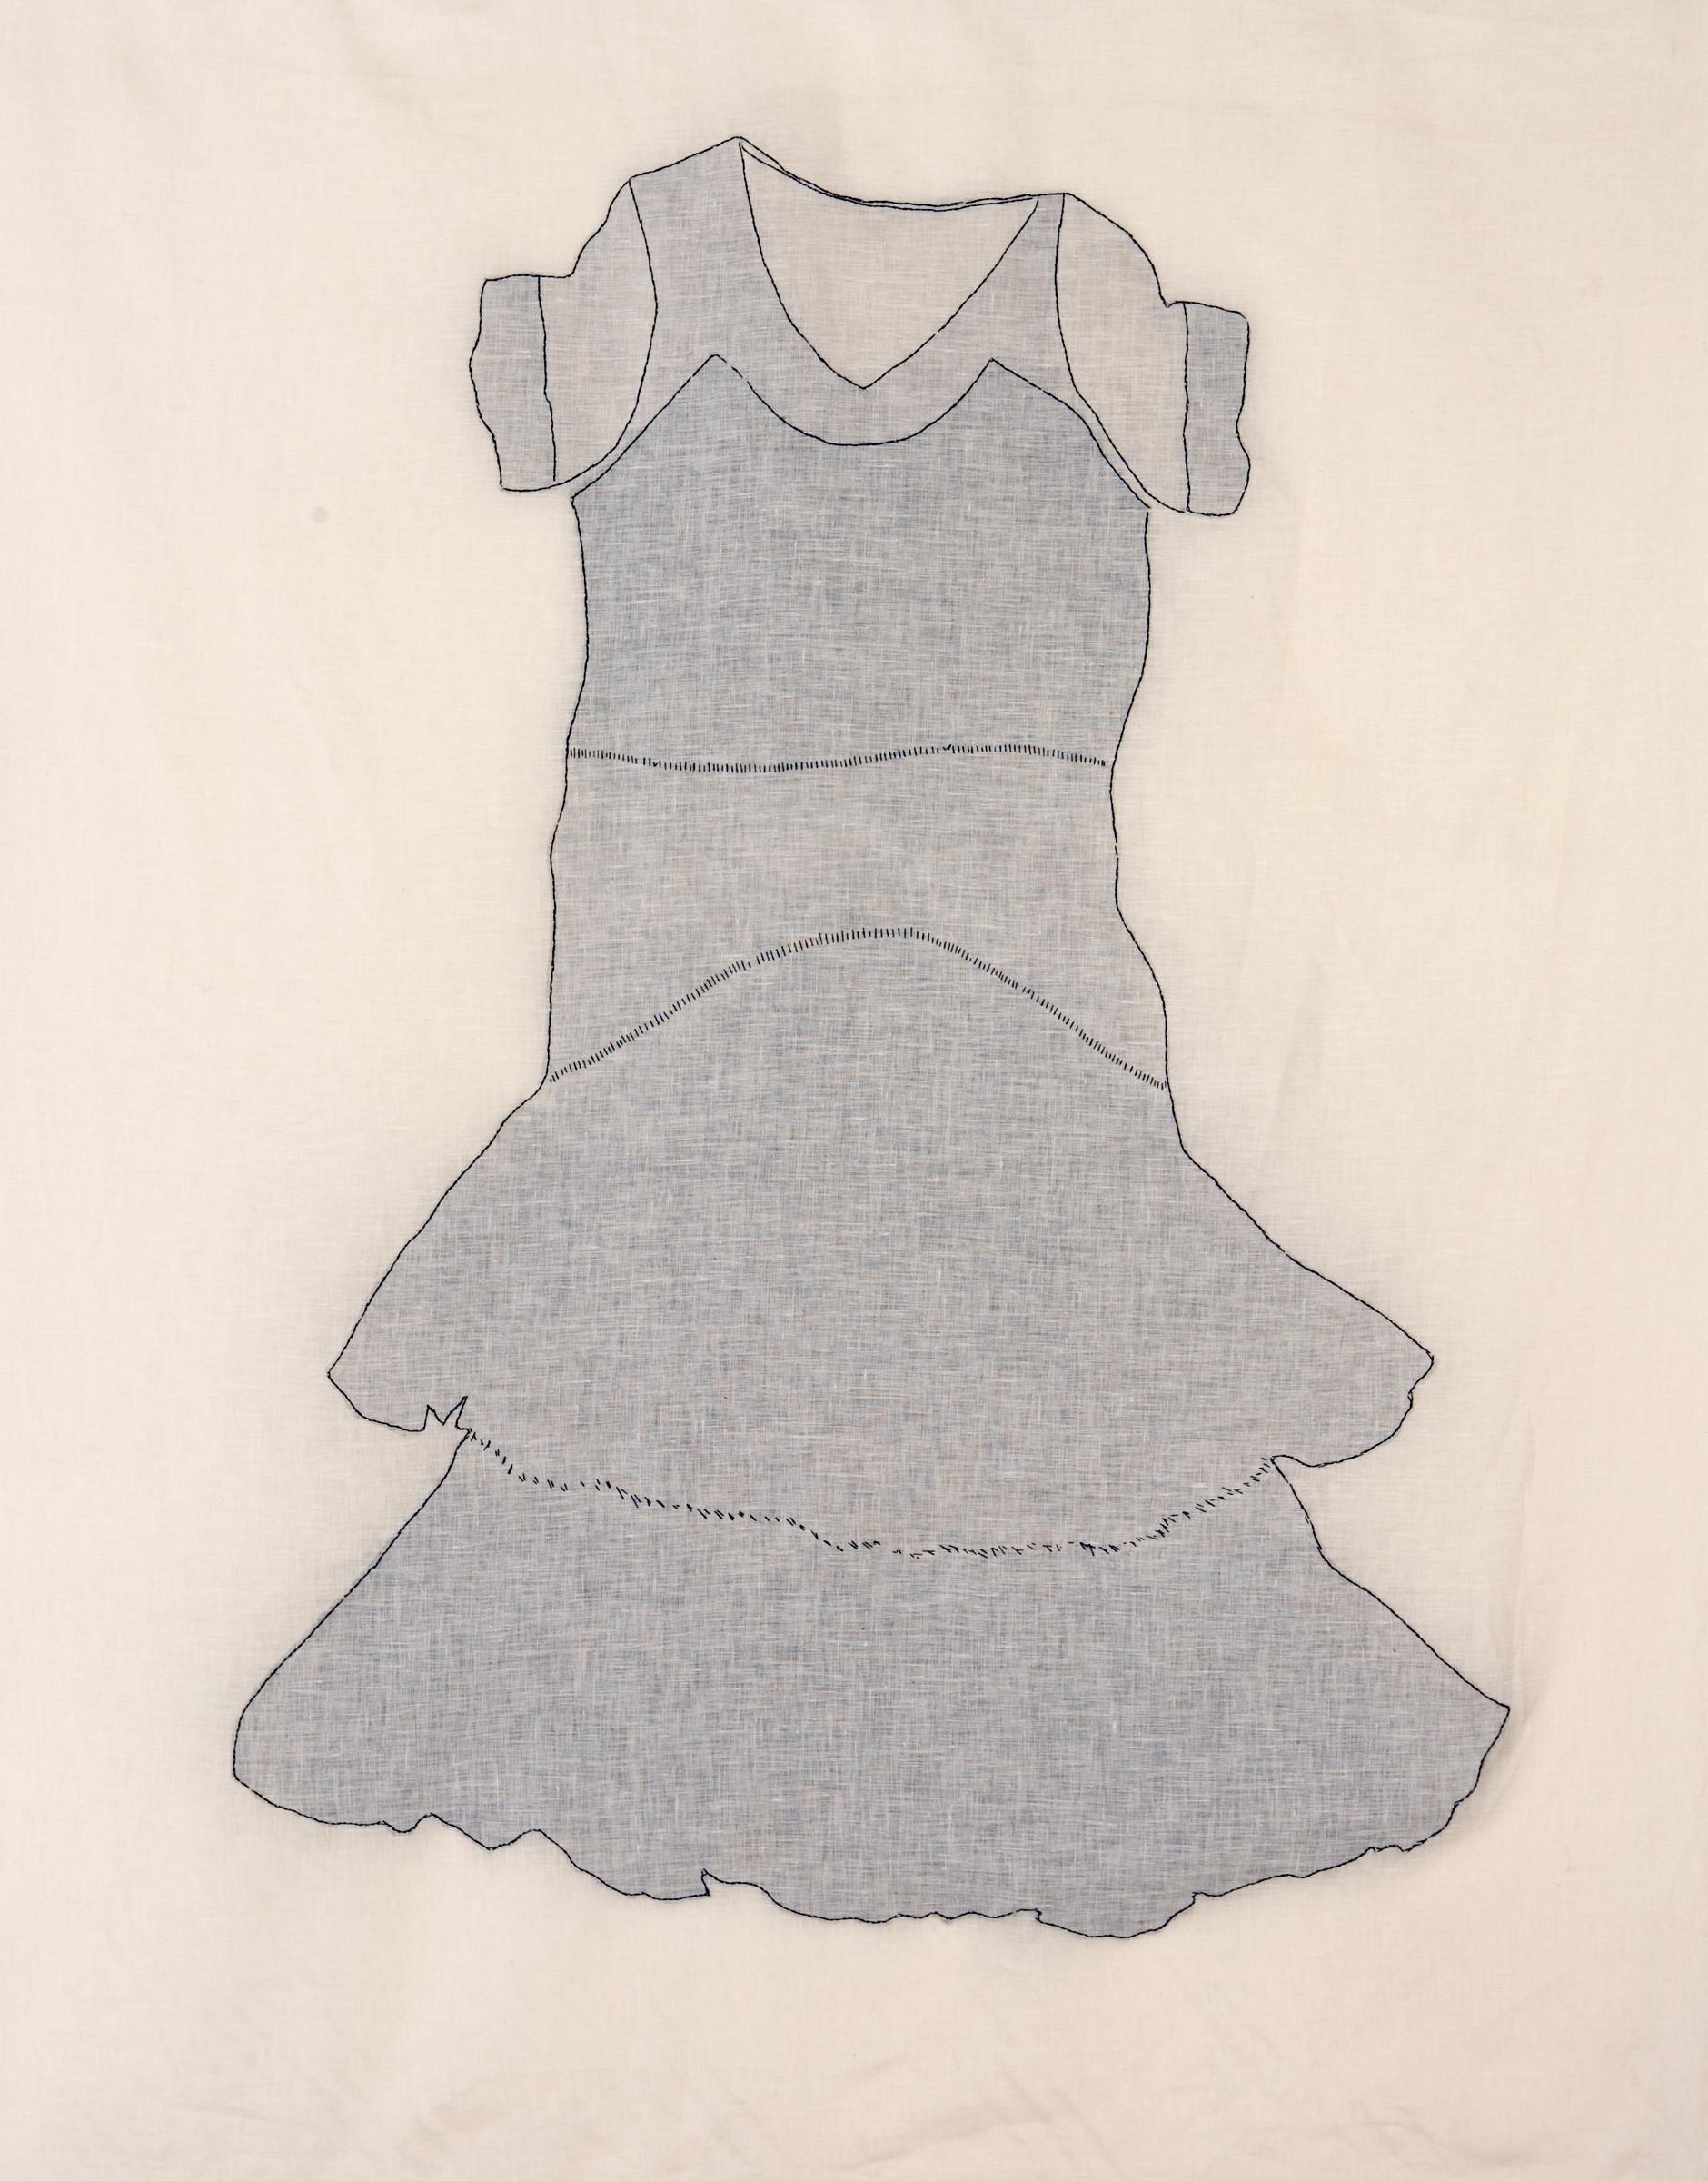 6_Black Dress;D-5SL(back)_2007.jpg